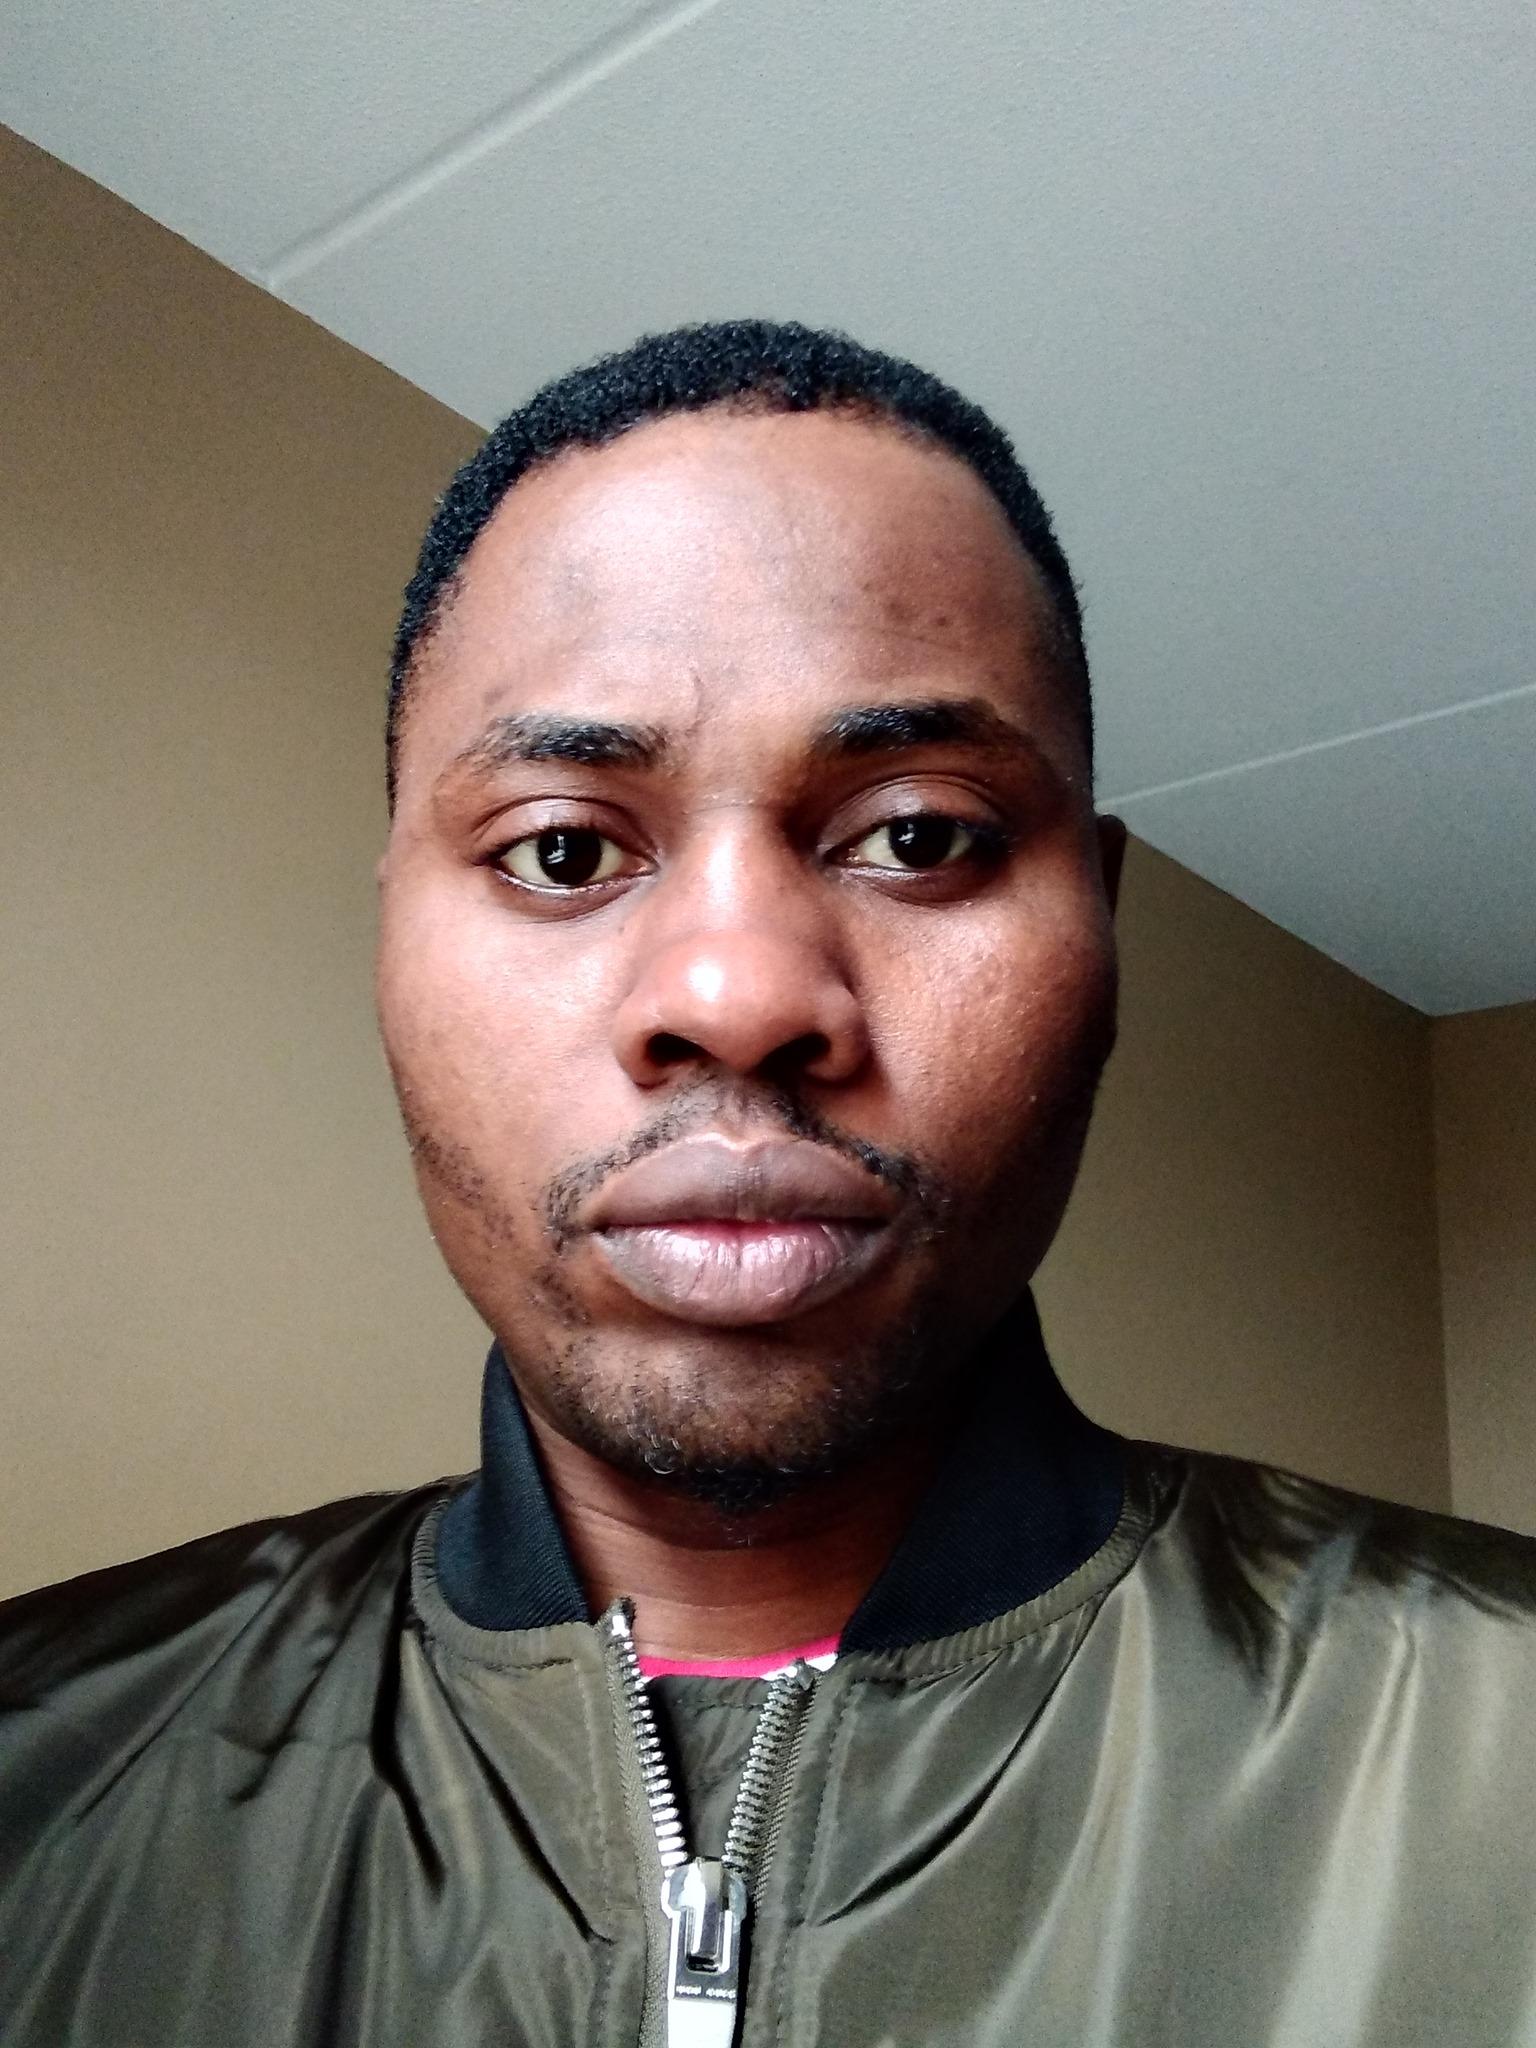 Emmanuel Richard from Nigeria